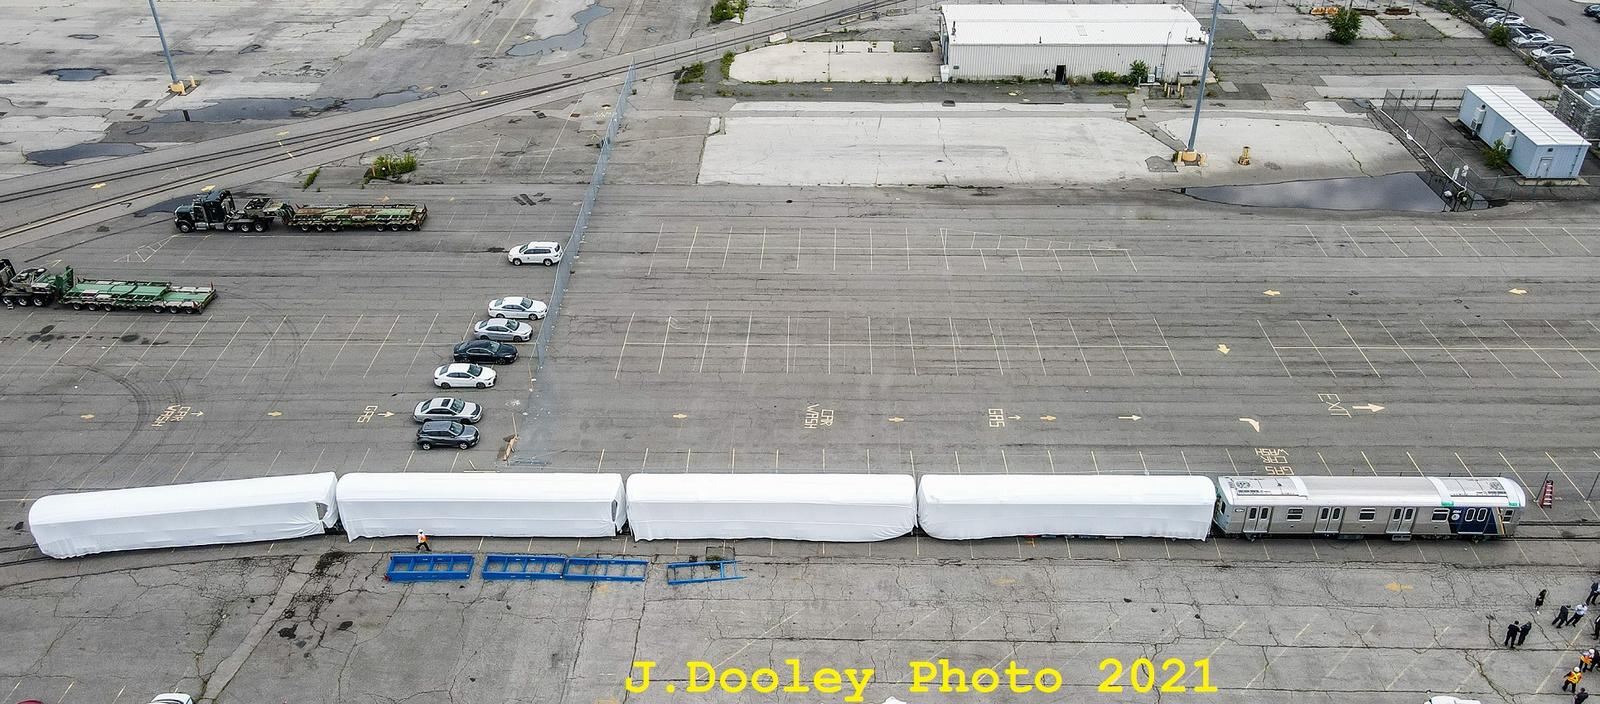 (583k, 1600x704)<br><b>Country:</b> United States<br><b>City:</b> New York<br><b>System:</b> New York City Transit<br><b>Car:</b> R-211 (Kawasaki, 2021-)  <br><b>Photo by:</b> John Dooley<br><b>Date:</b> 7/1/2021<br><b>Notes:</b> R-211 delivery and press conference.<br><b>Viewed (this week/total):</b> 0 / 197